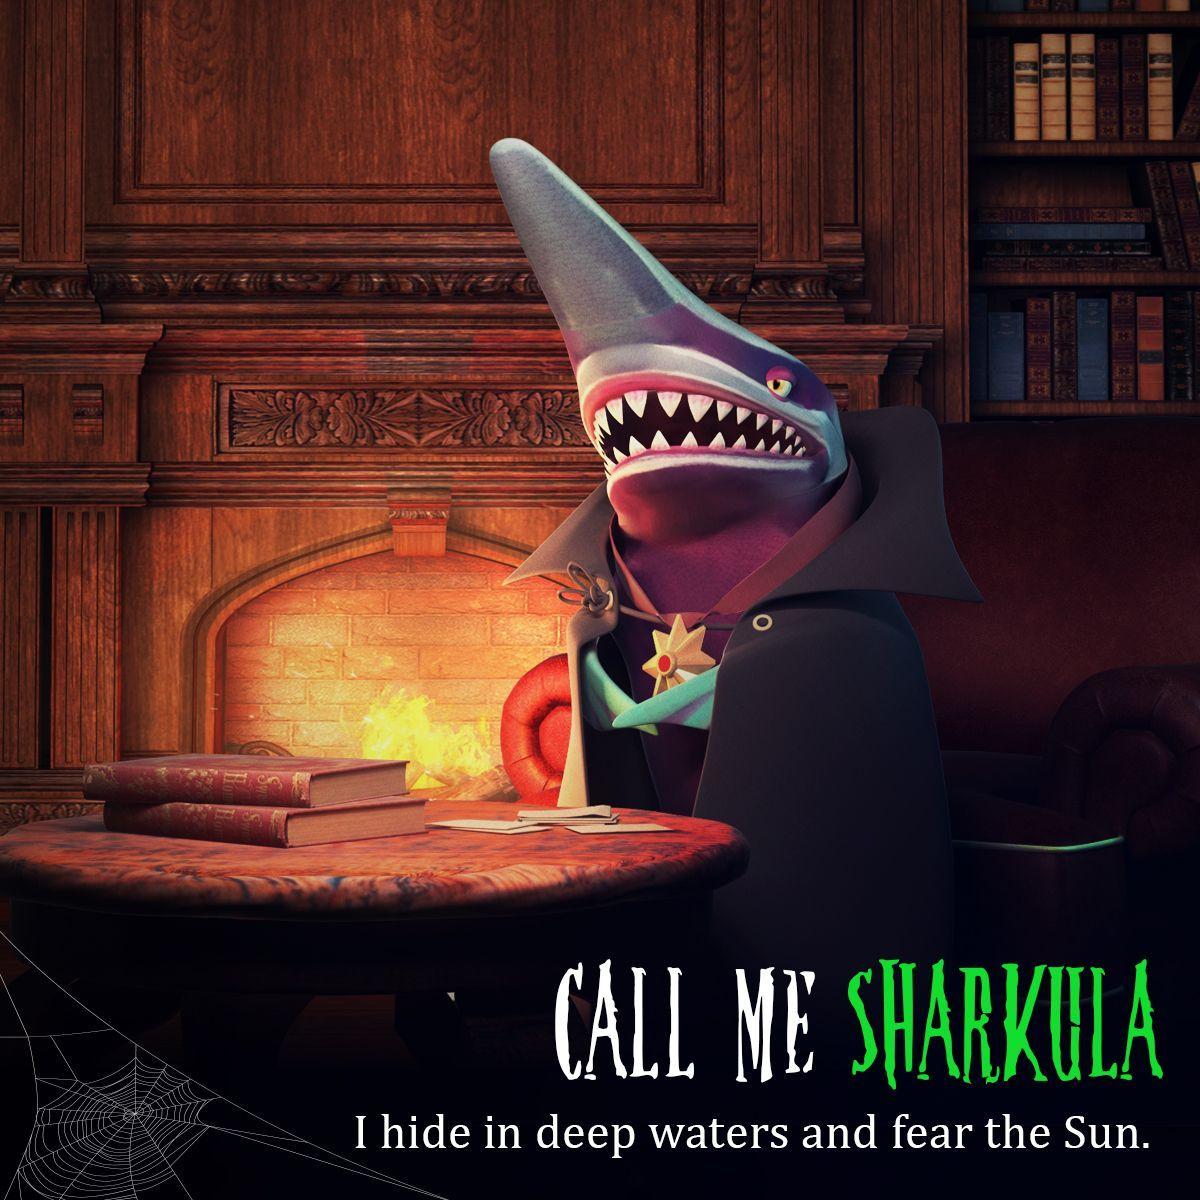 Call me SHARKULA Shark, Goblin shark, Great white shark